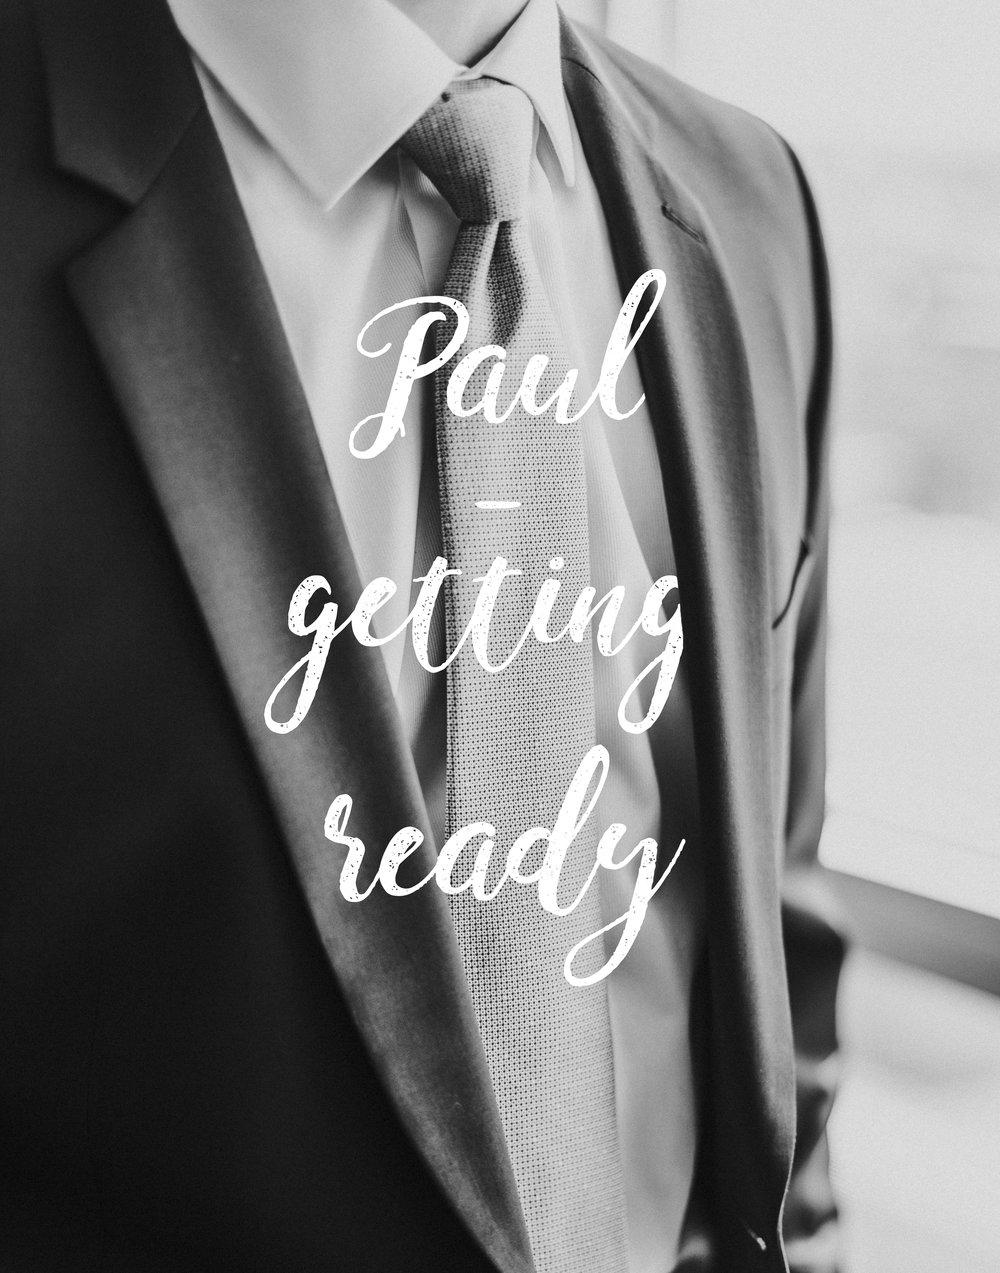 PAUL-GETTING READY-001.jpg